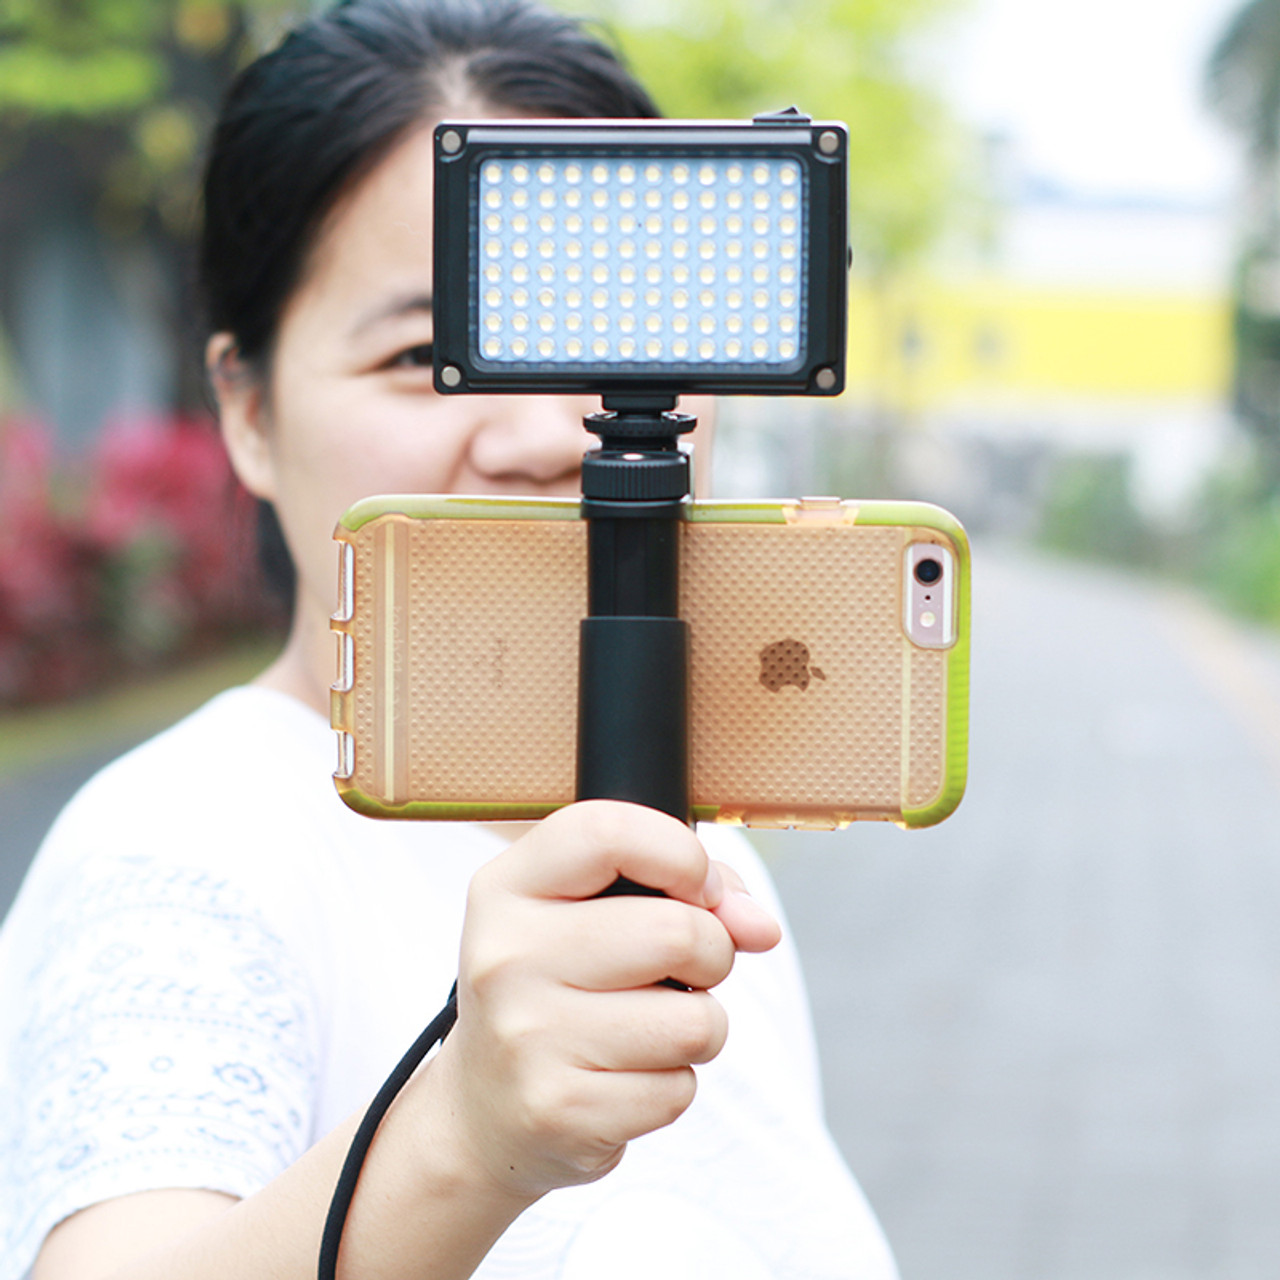 96 LED Phone Video Light Photo Lighting on Camera Hot Shoe LED Lamp